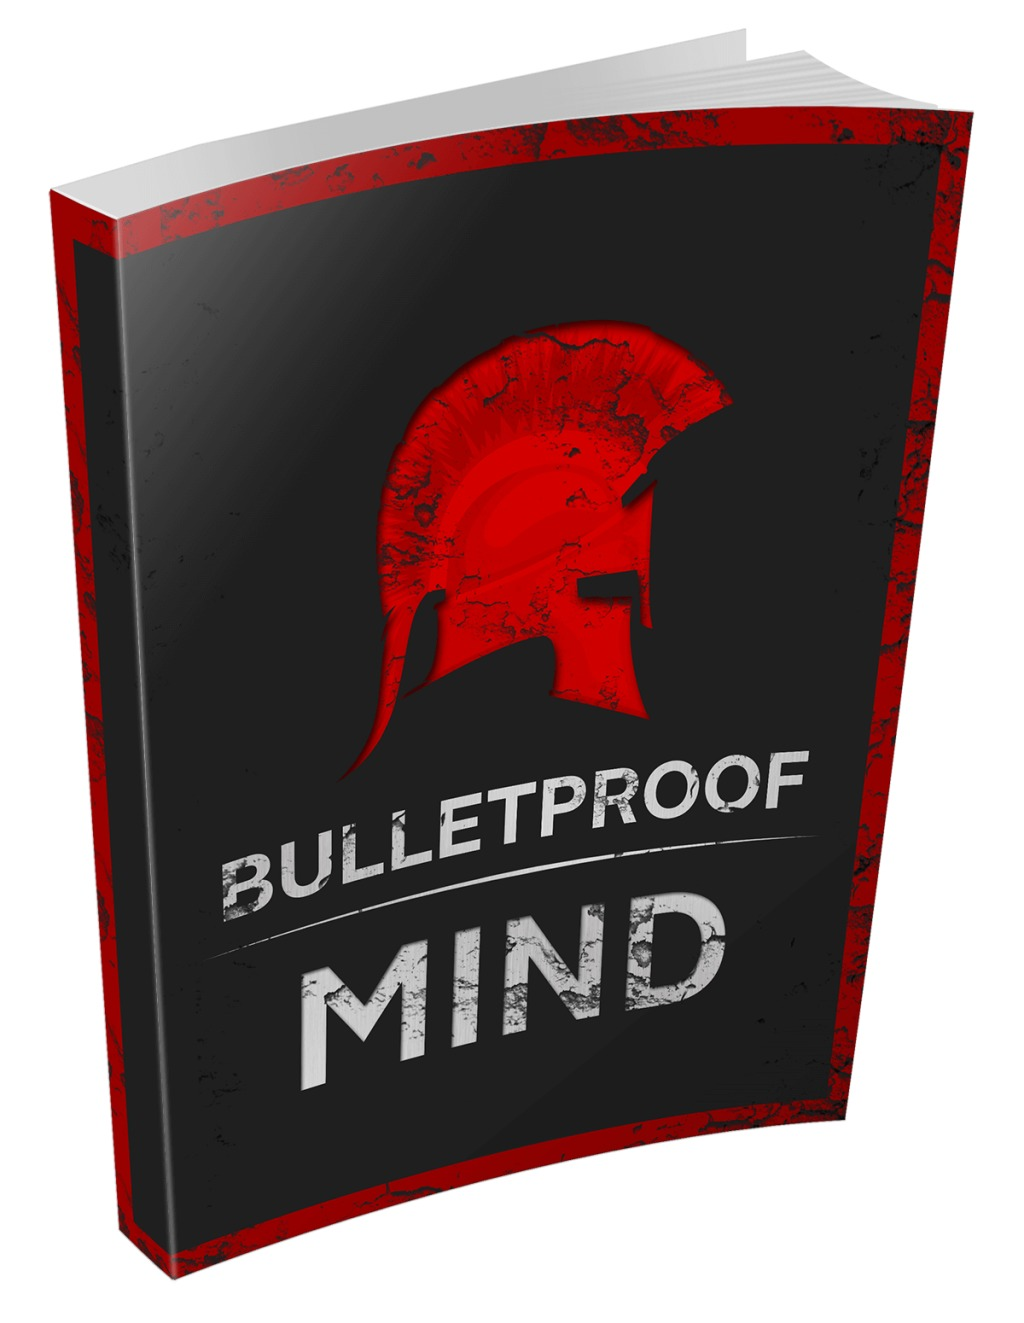 Buletproof Mind